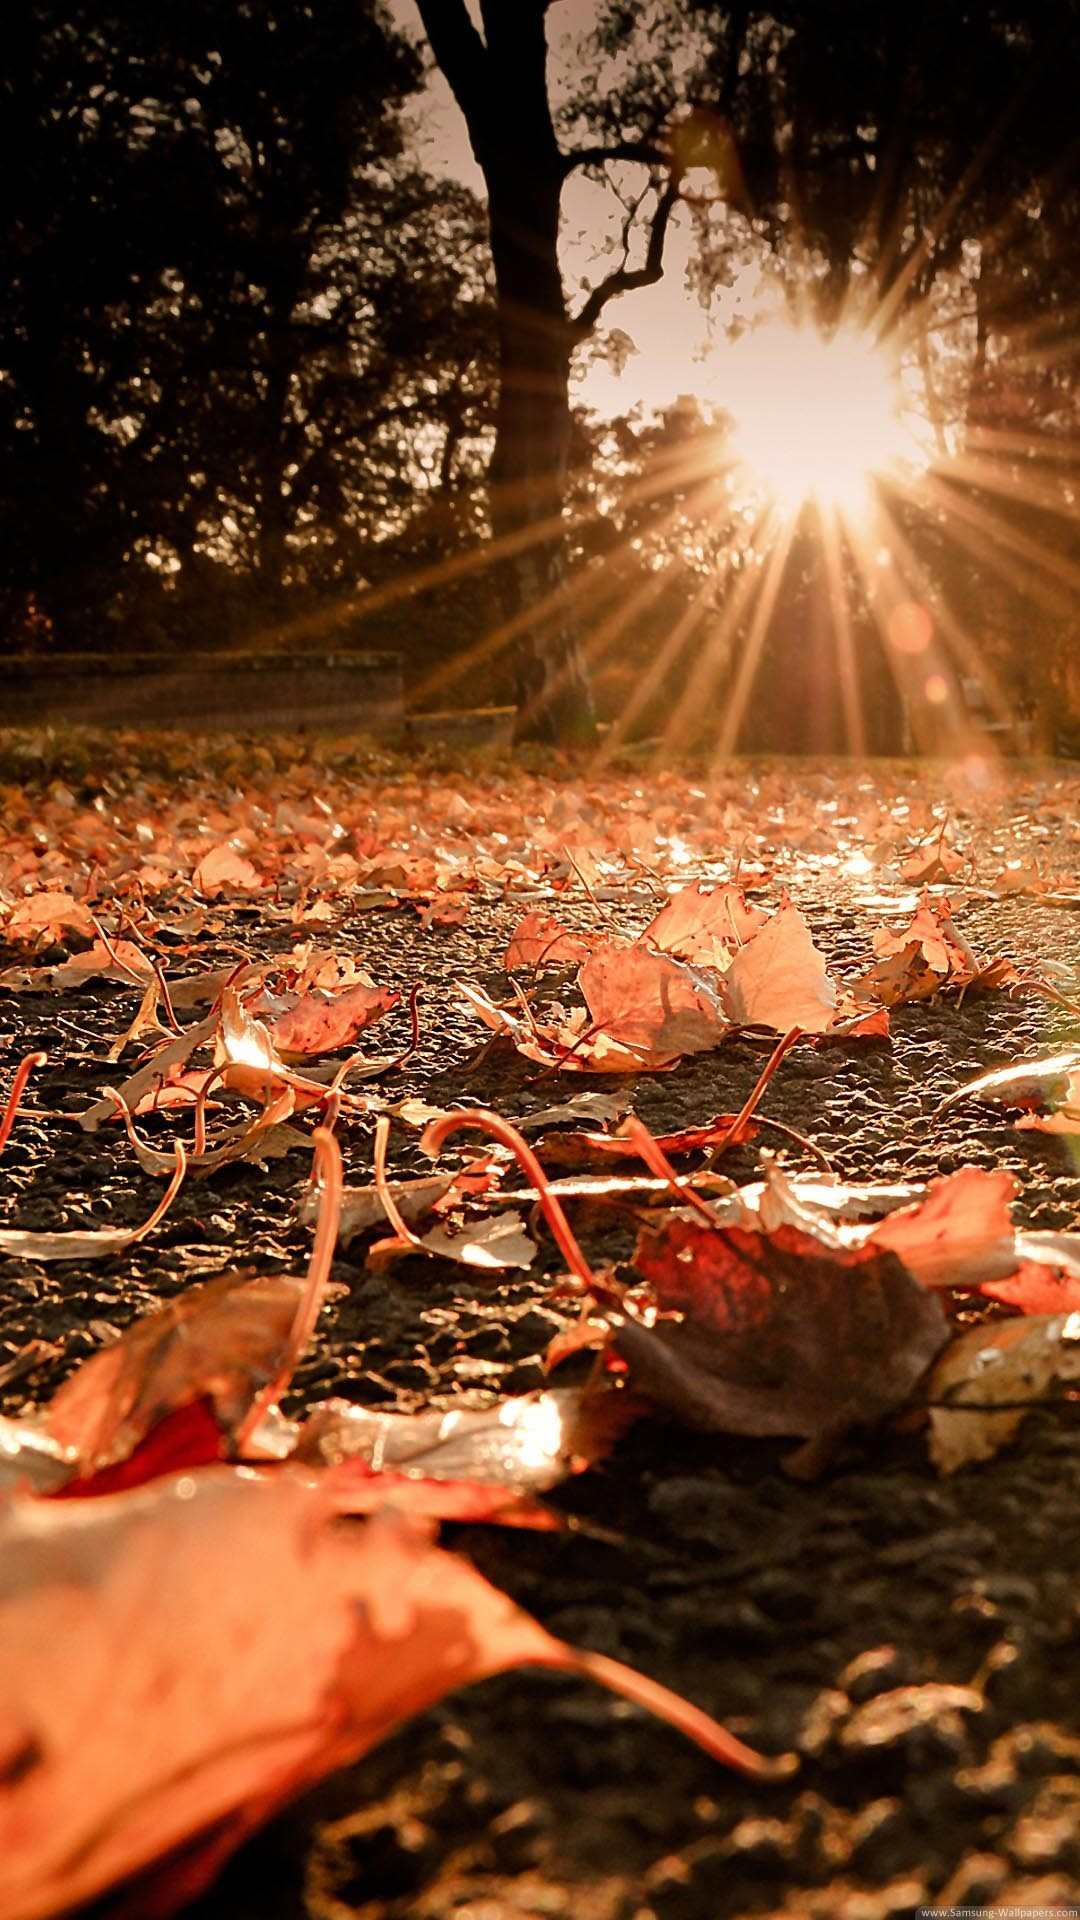 Iphone 6 Autumn Wallpaper 87 Images